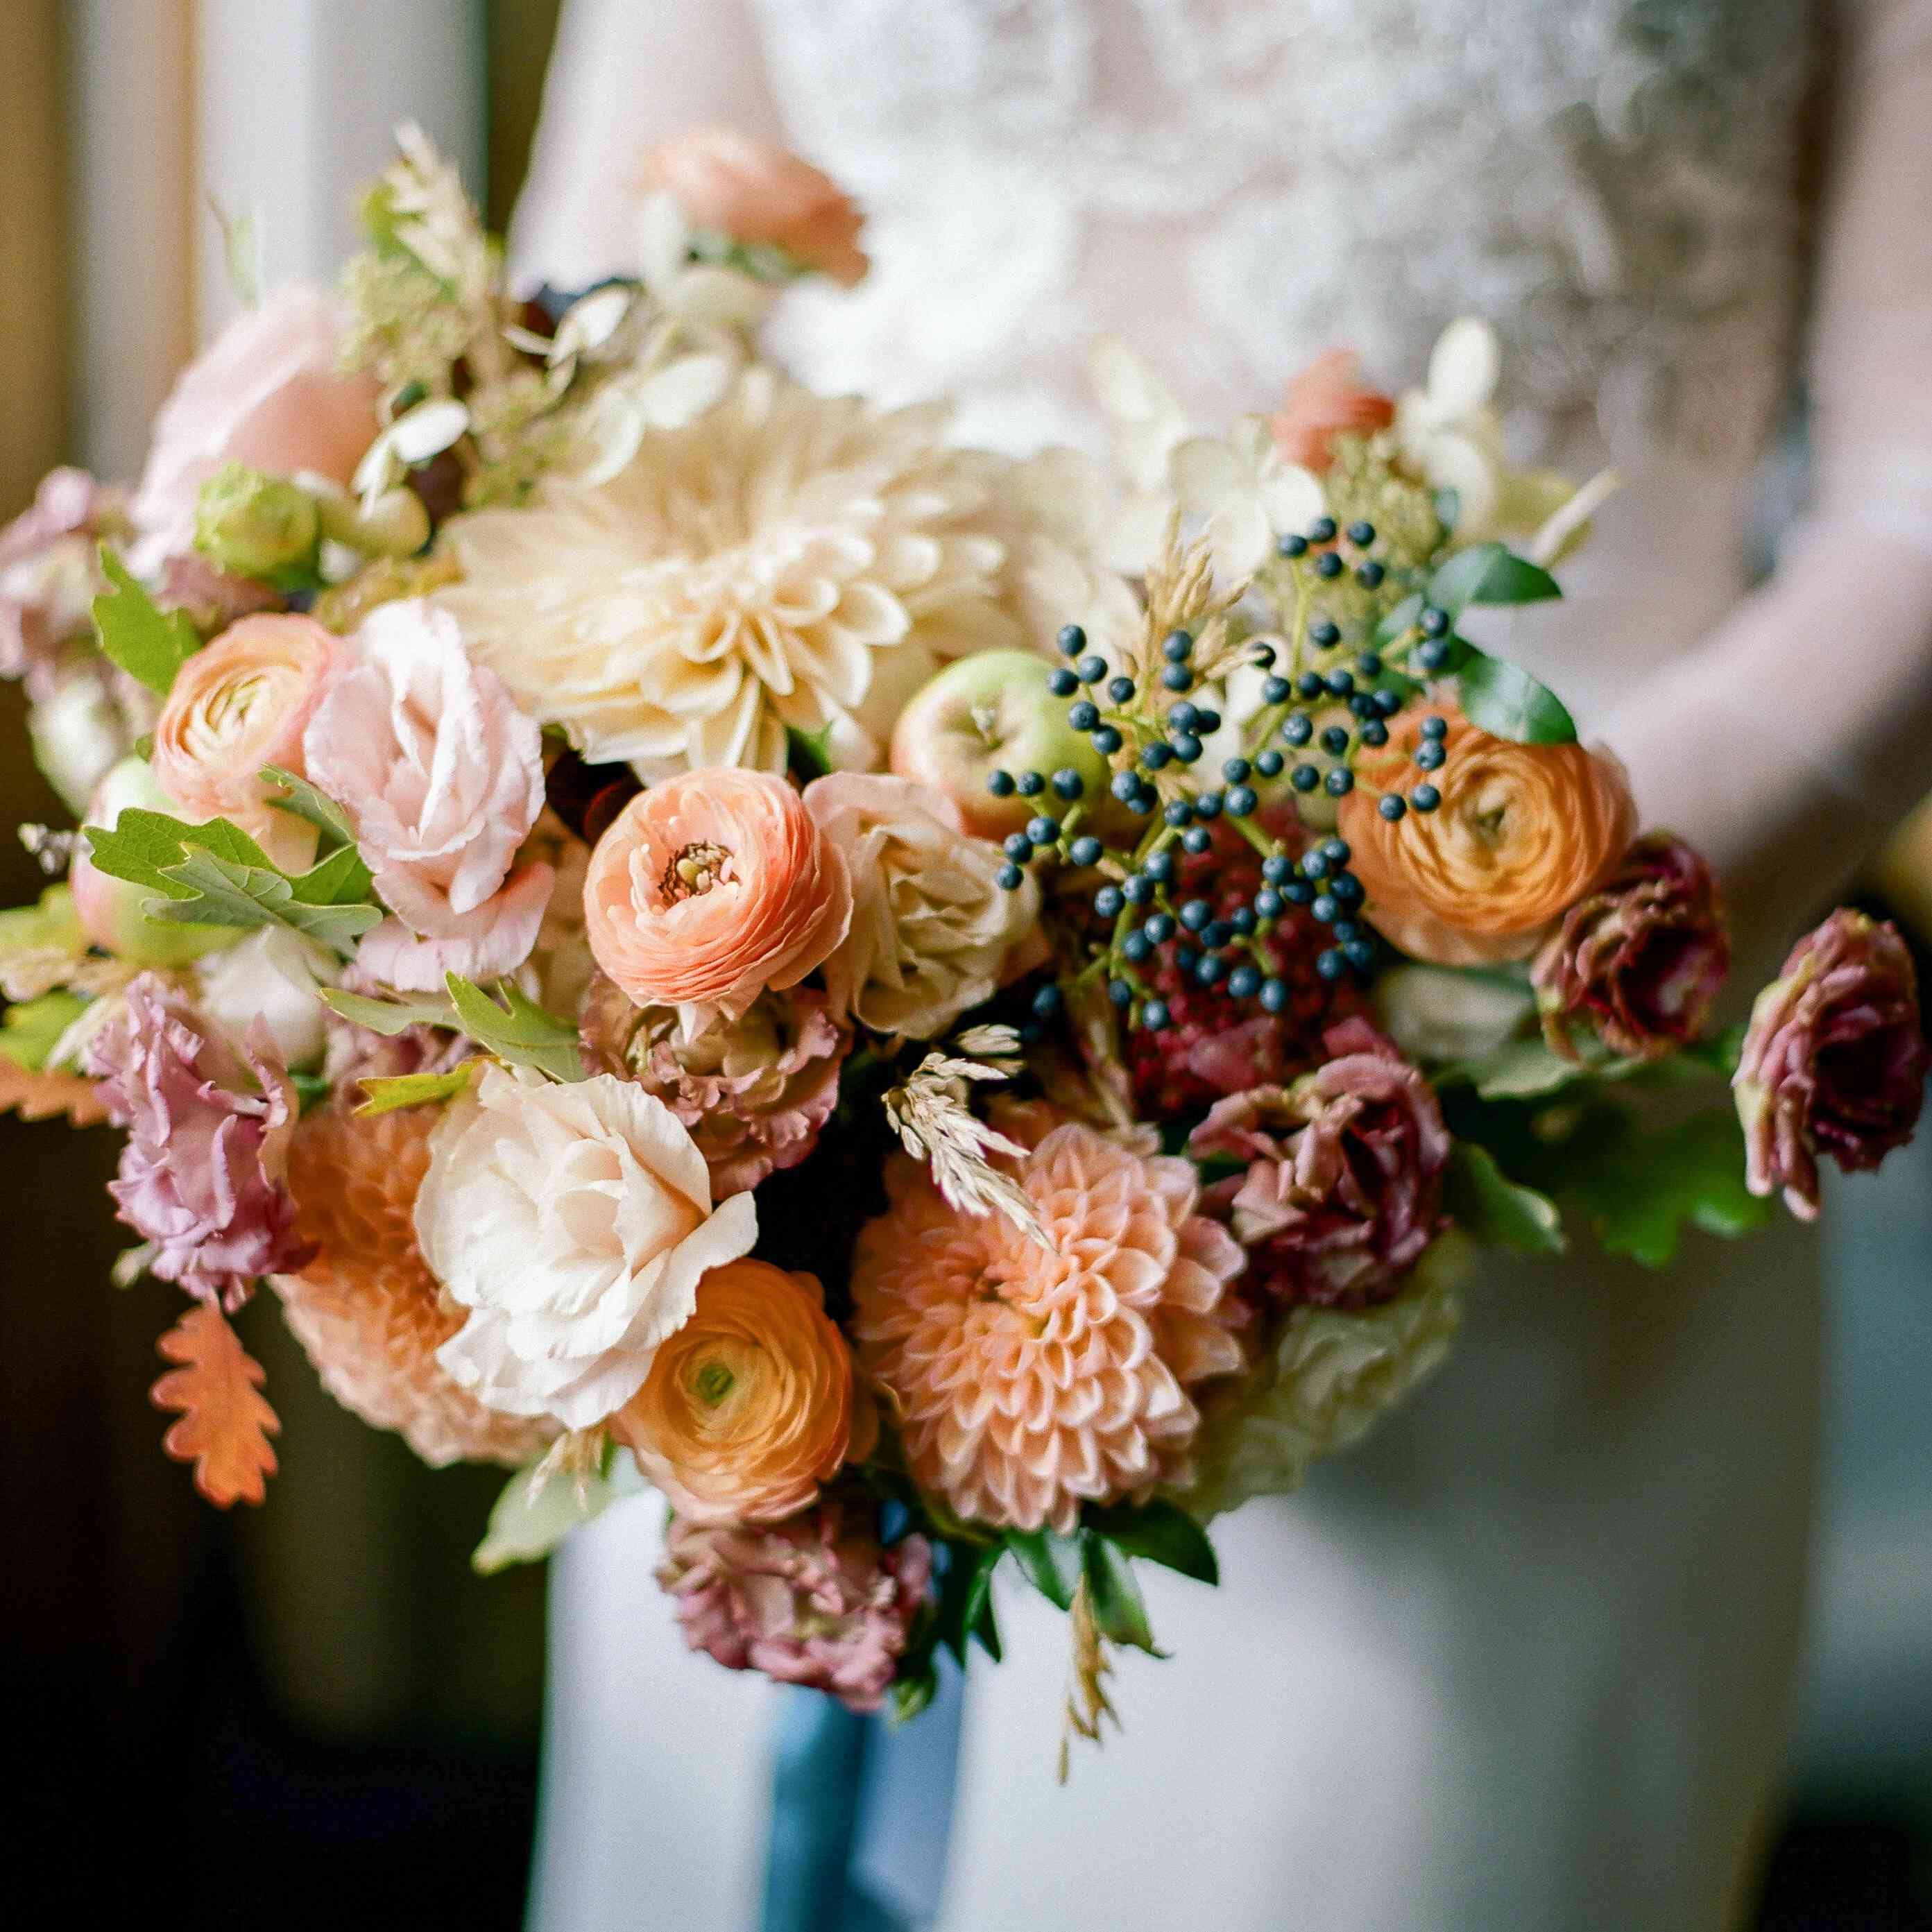 Autumnal bouquet featuring dahlias and ranunculus